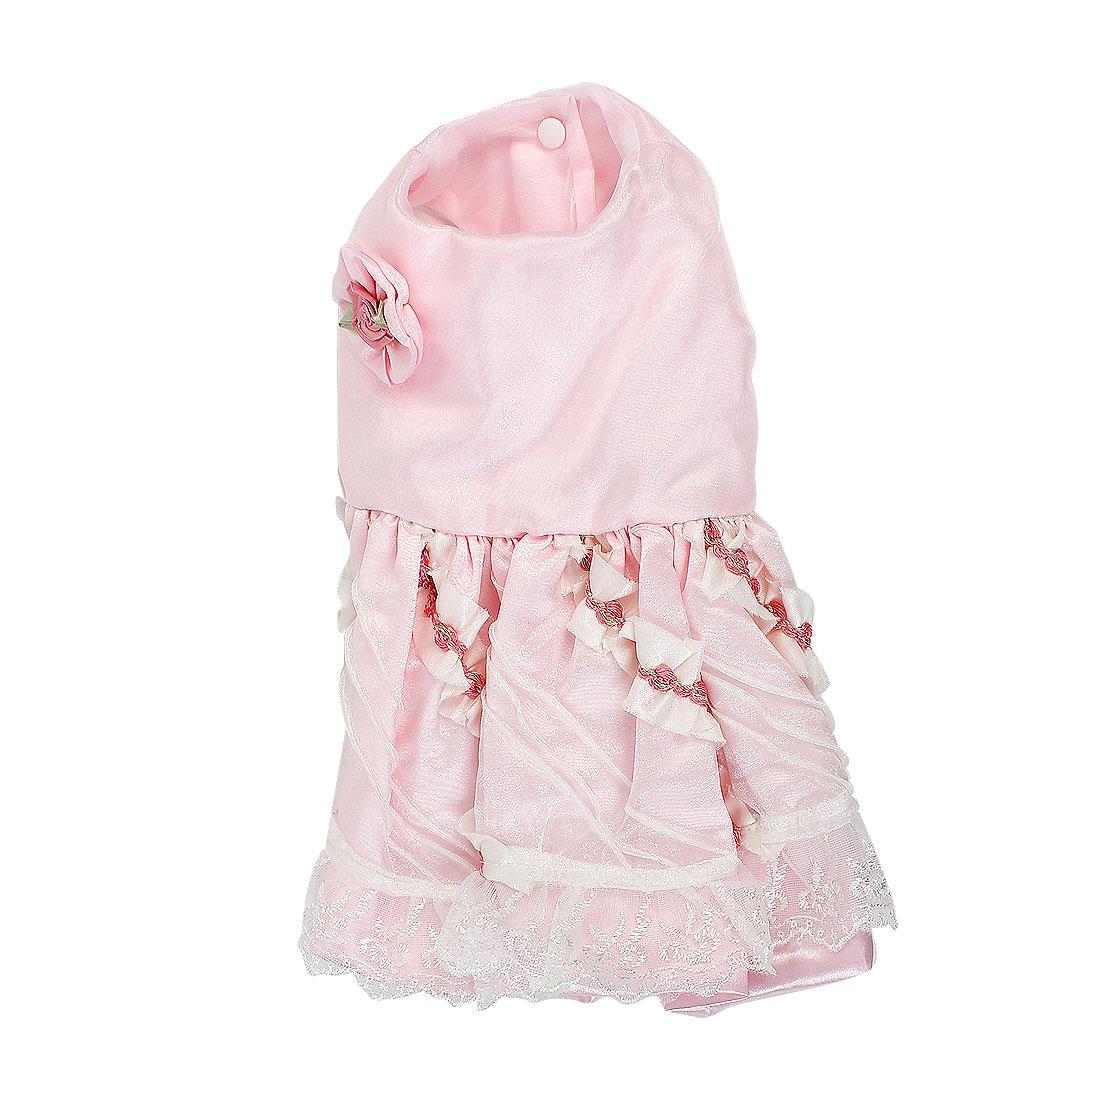 Pet Dog Doggie Rose Lace Decor Princess Wedding Dress Skirt Pink Size S